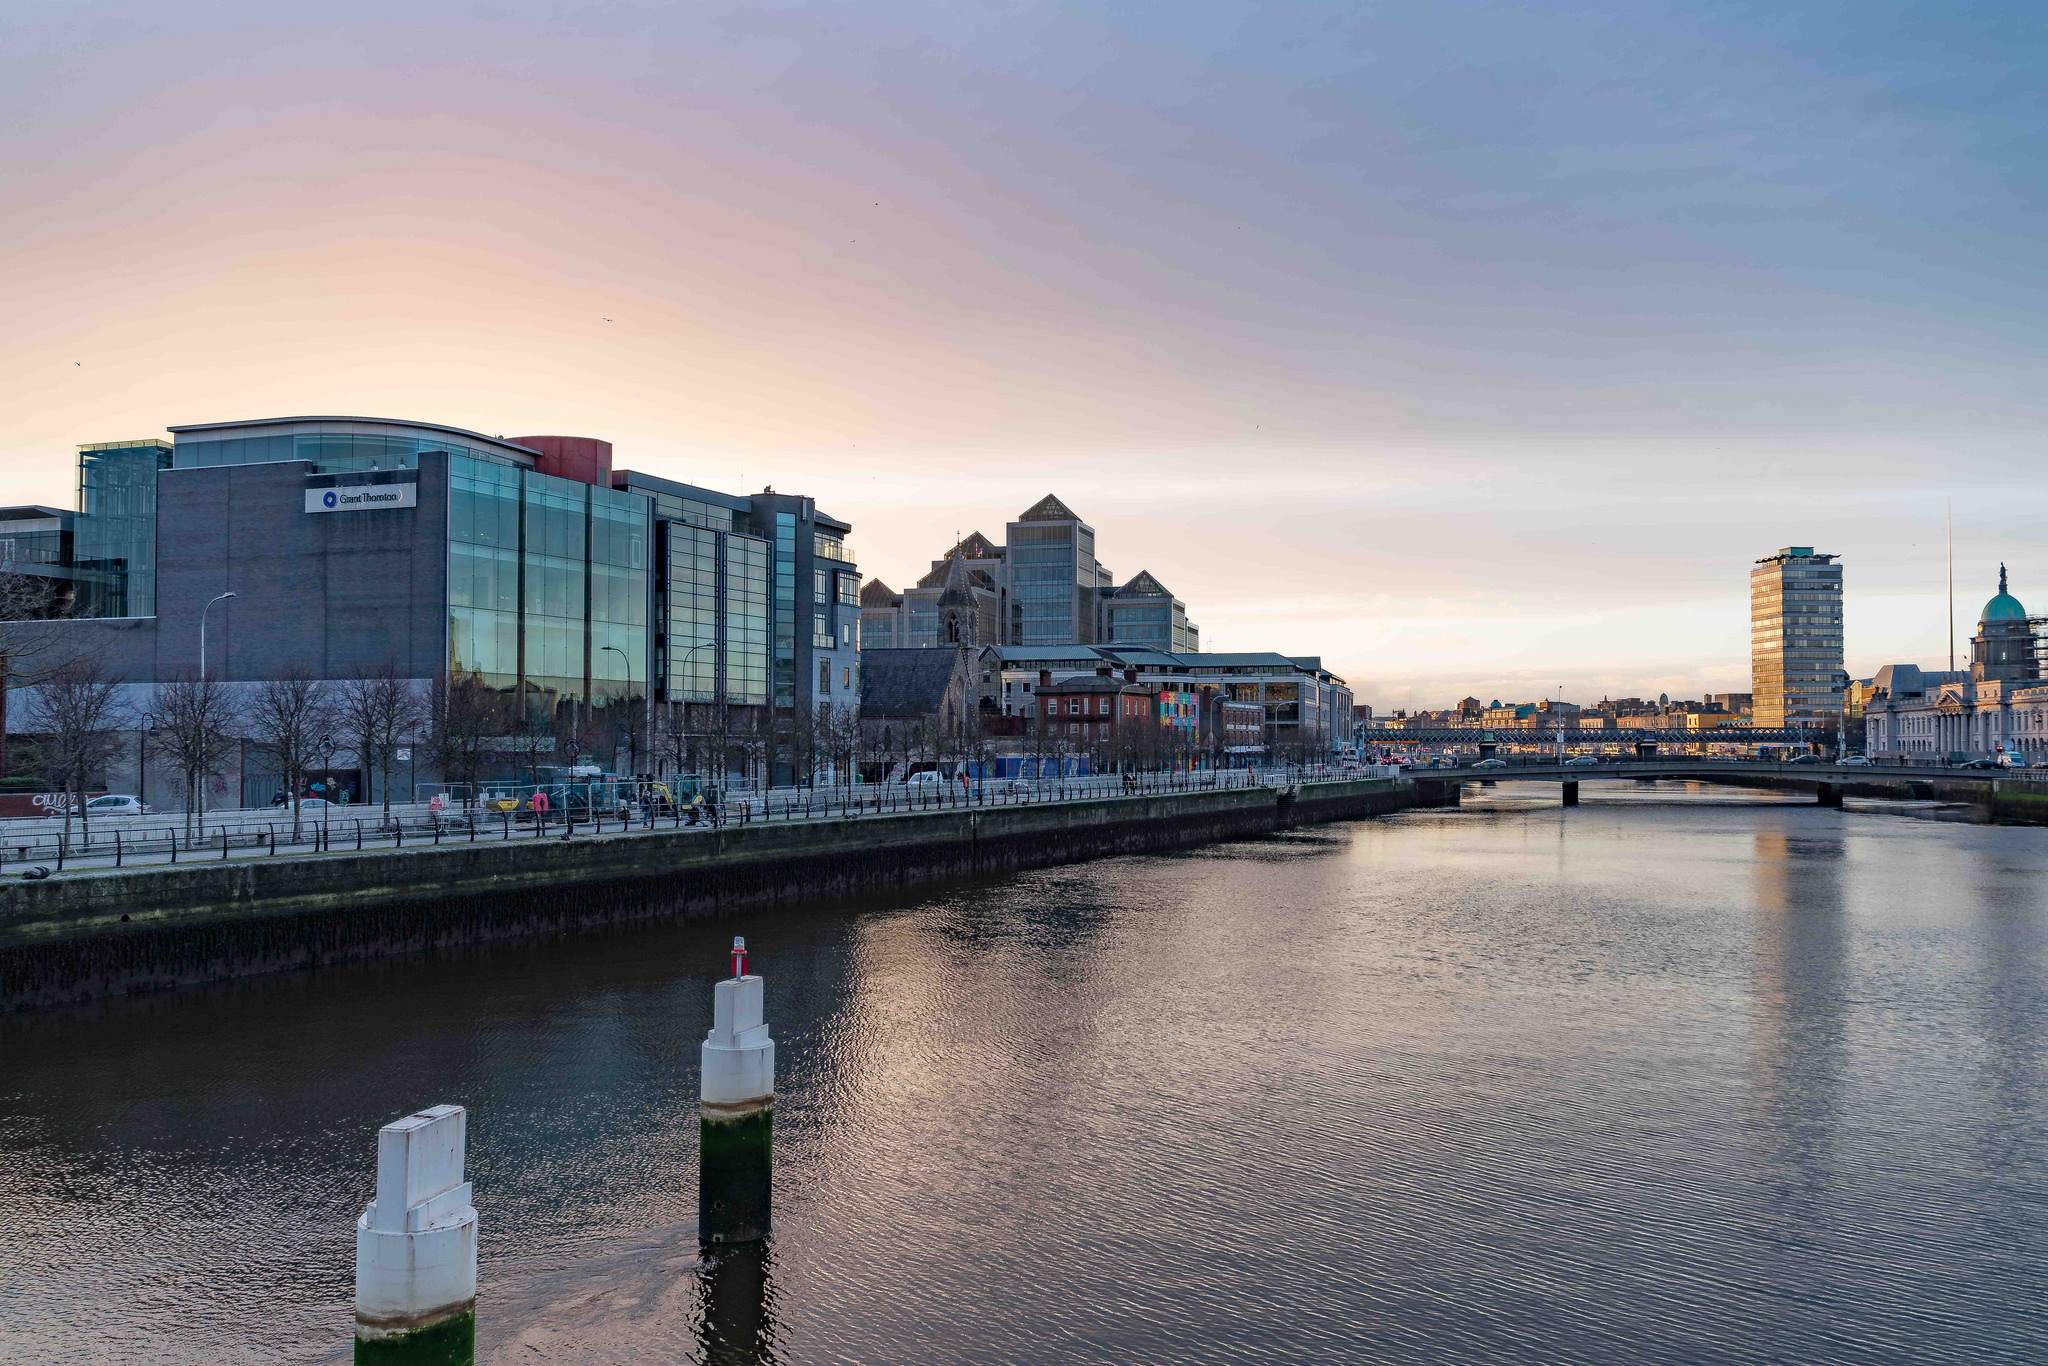 dublin docklands6 Walking Around Dublin Docklands by Marphy